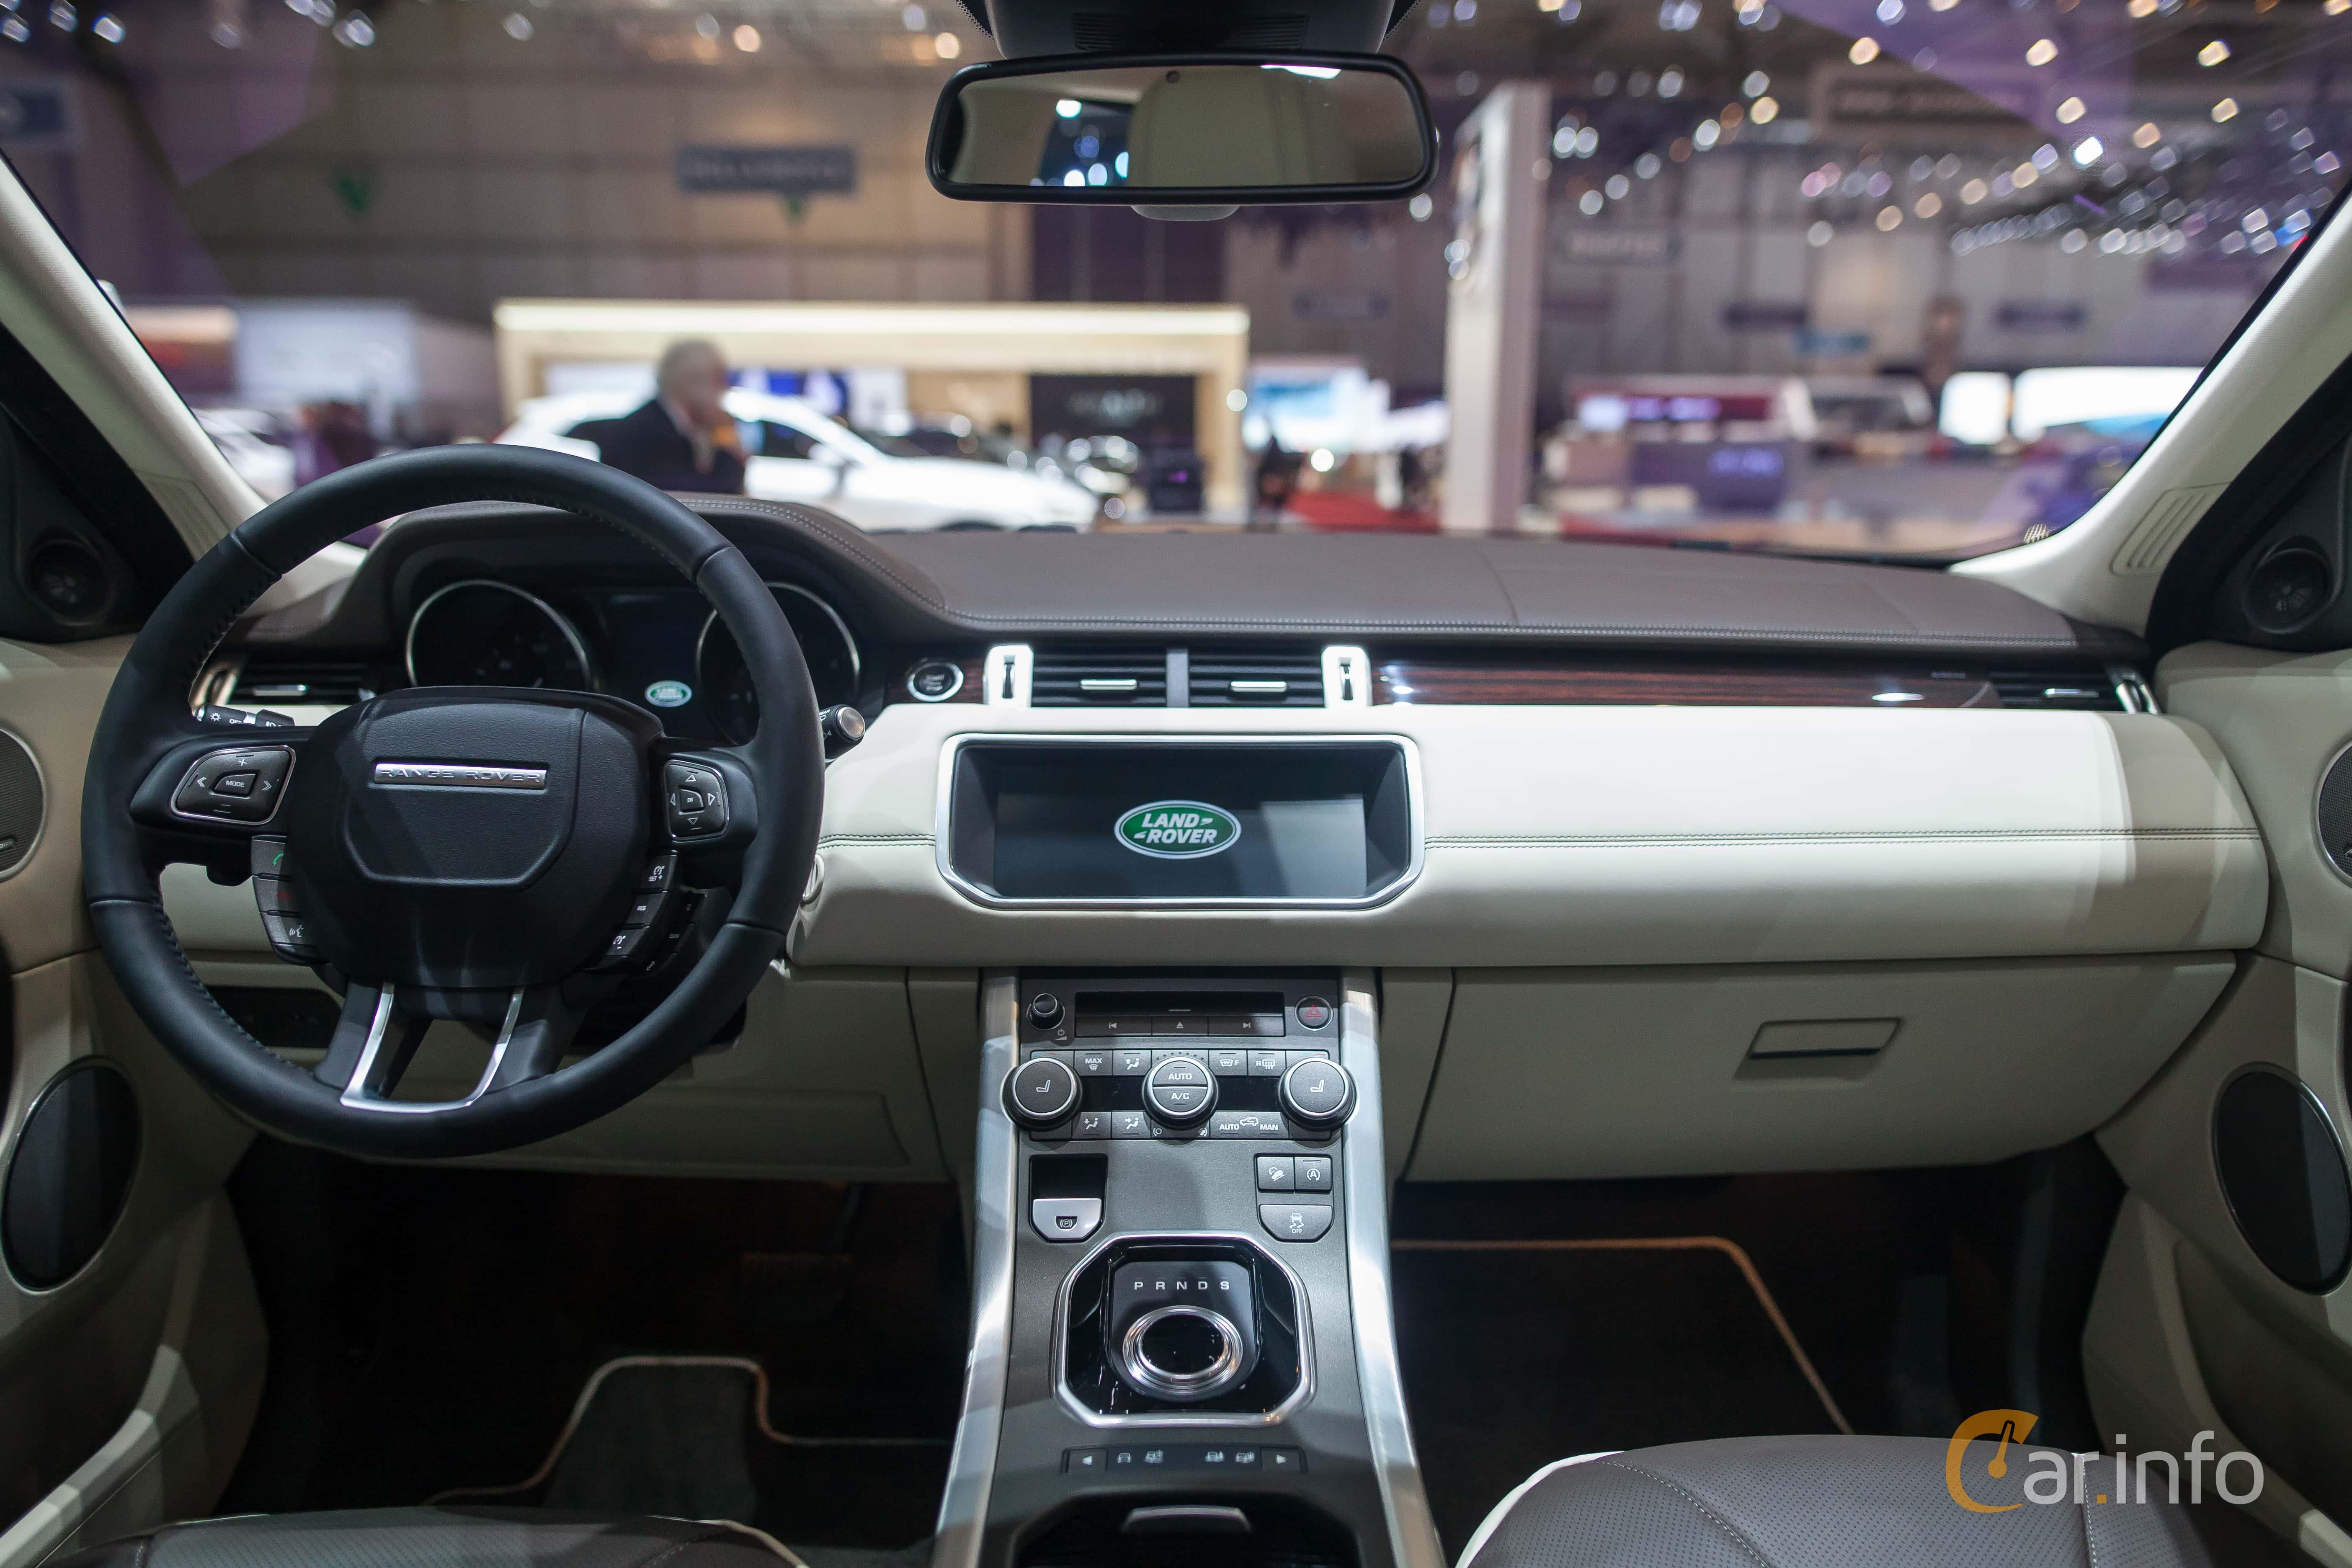 8 Images Of Land Rover Range Rover Evoque 5 Door 2017 By